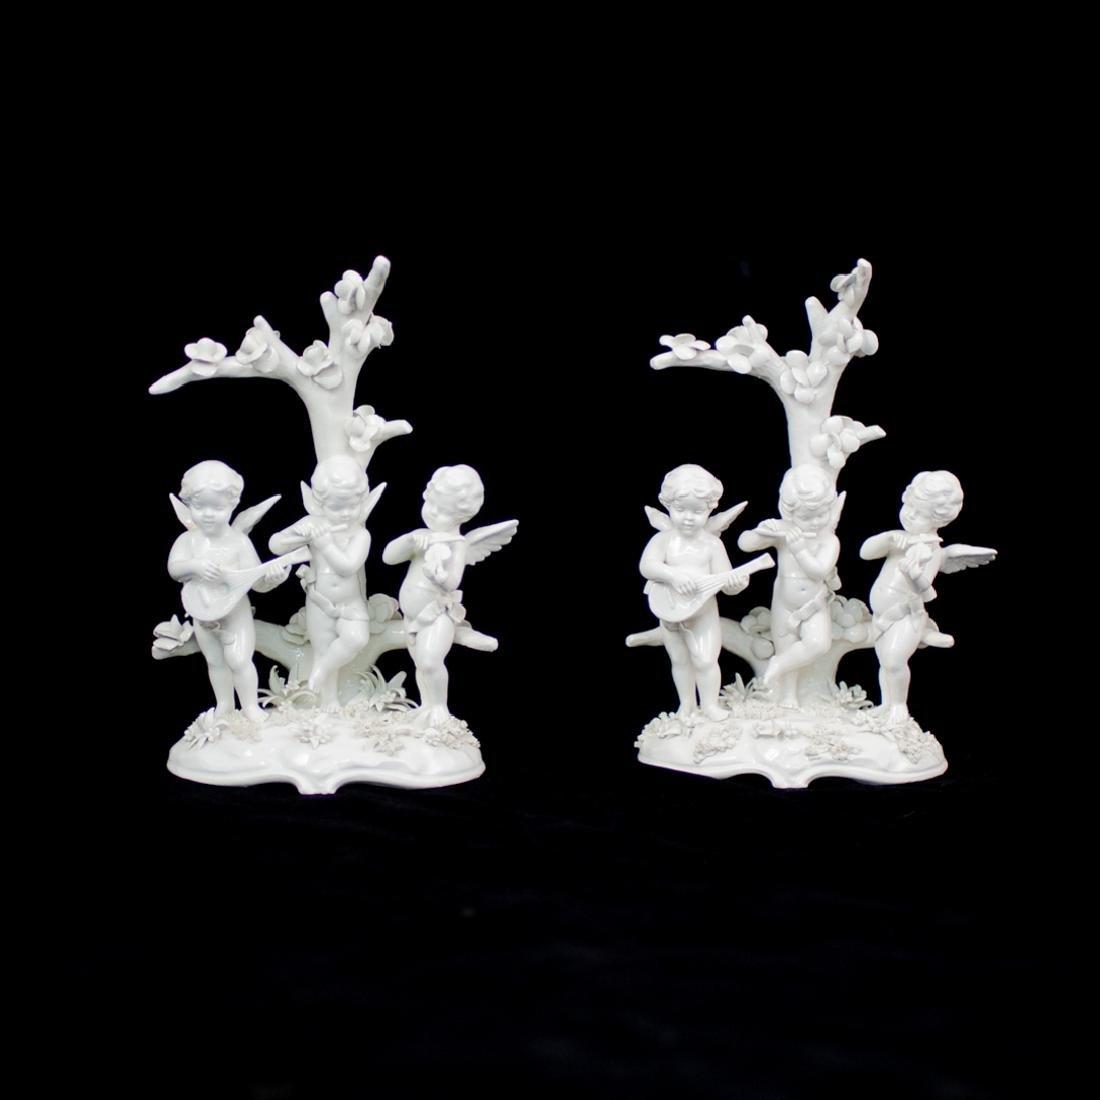 Pair of Italian White Porcelain Figural Group